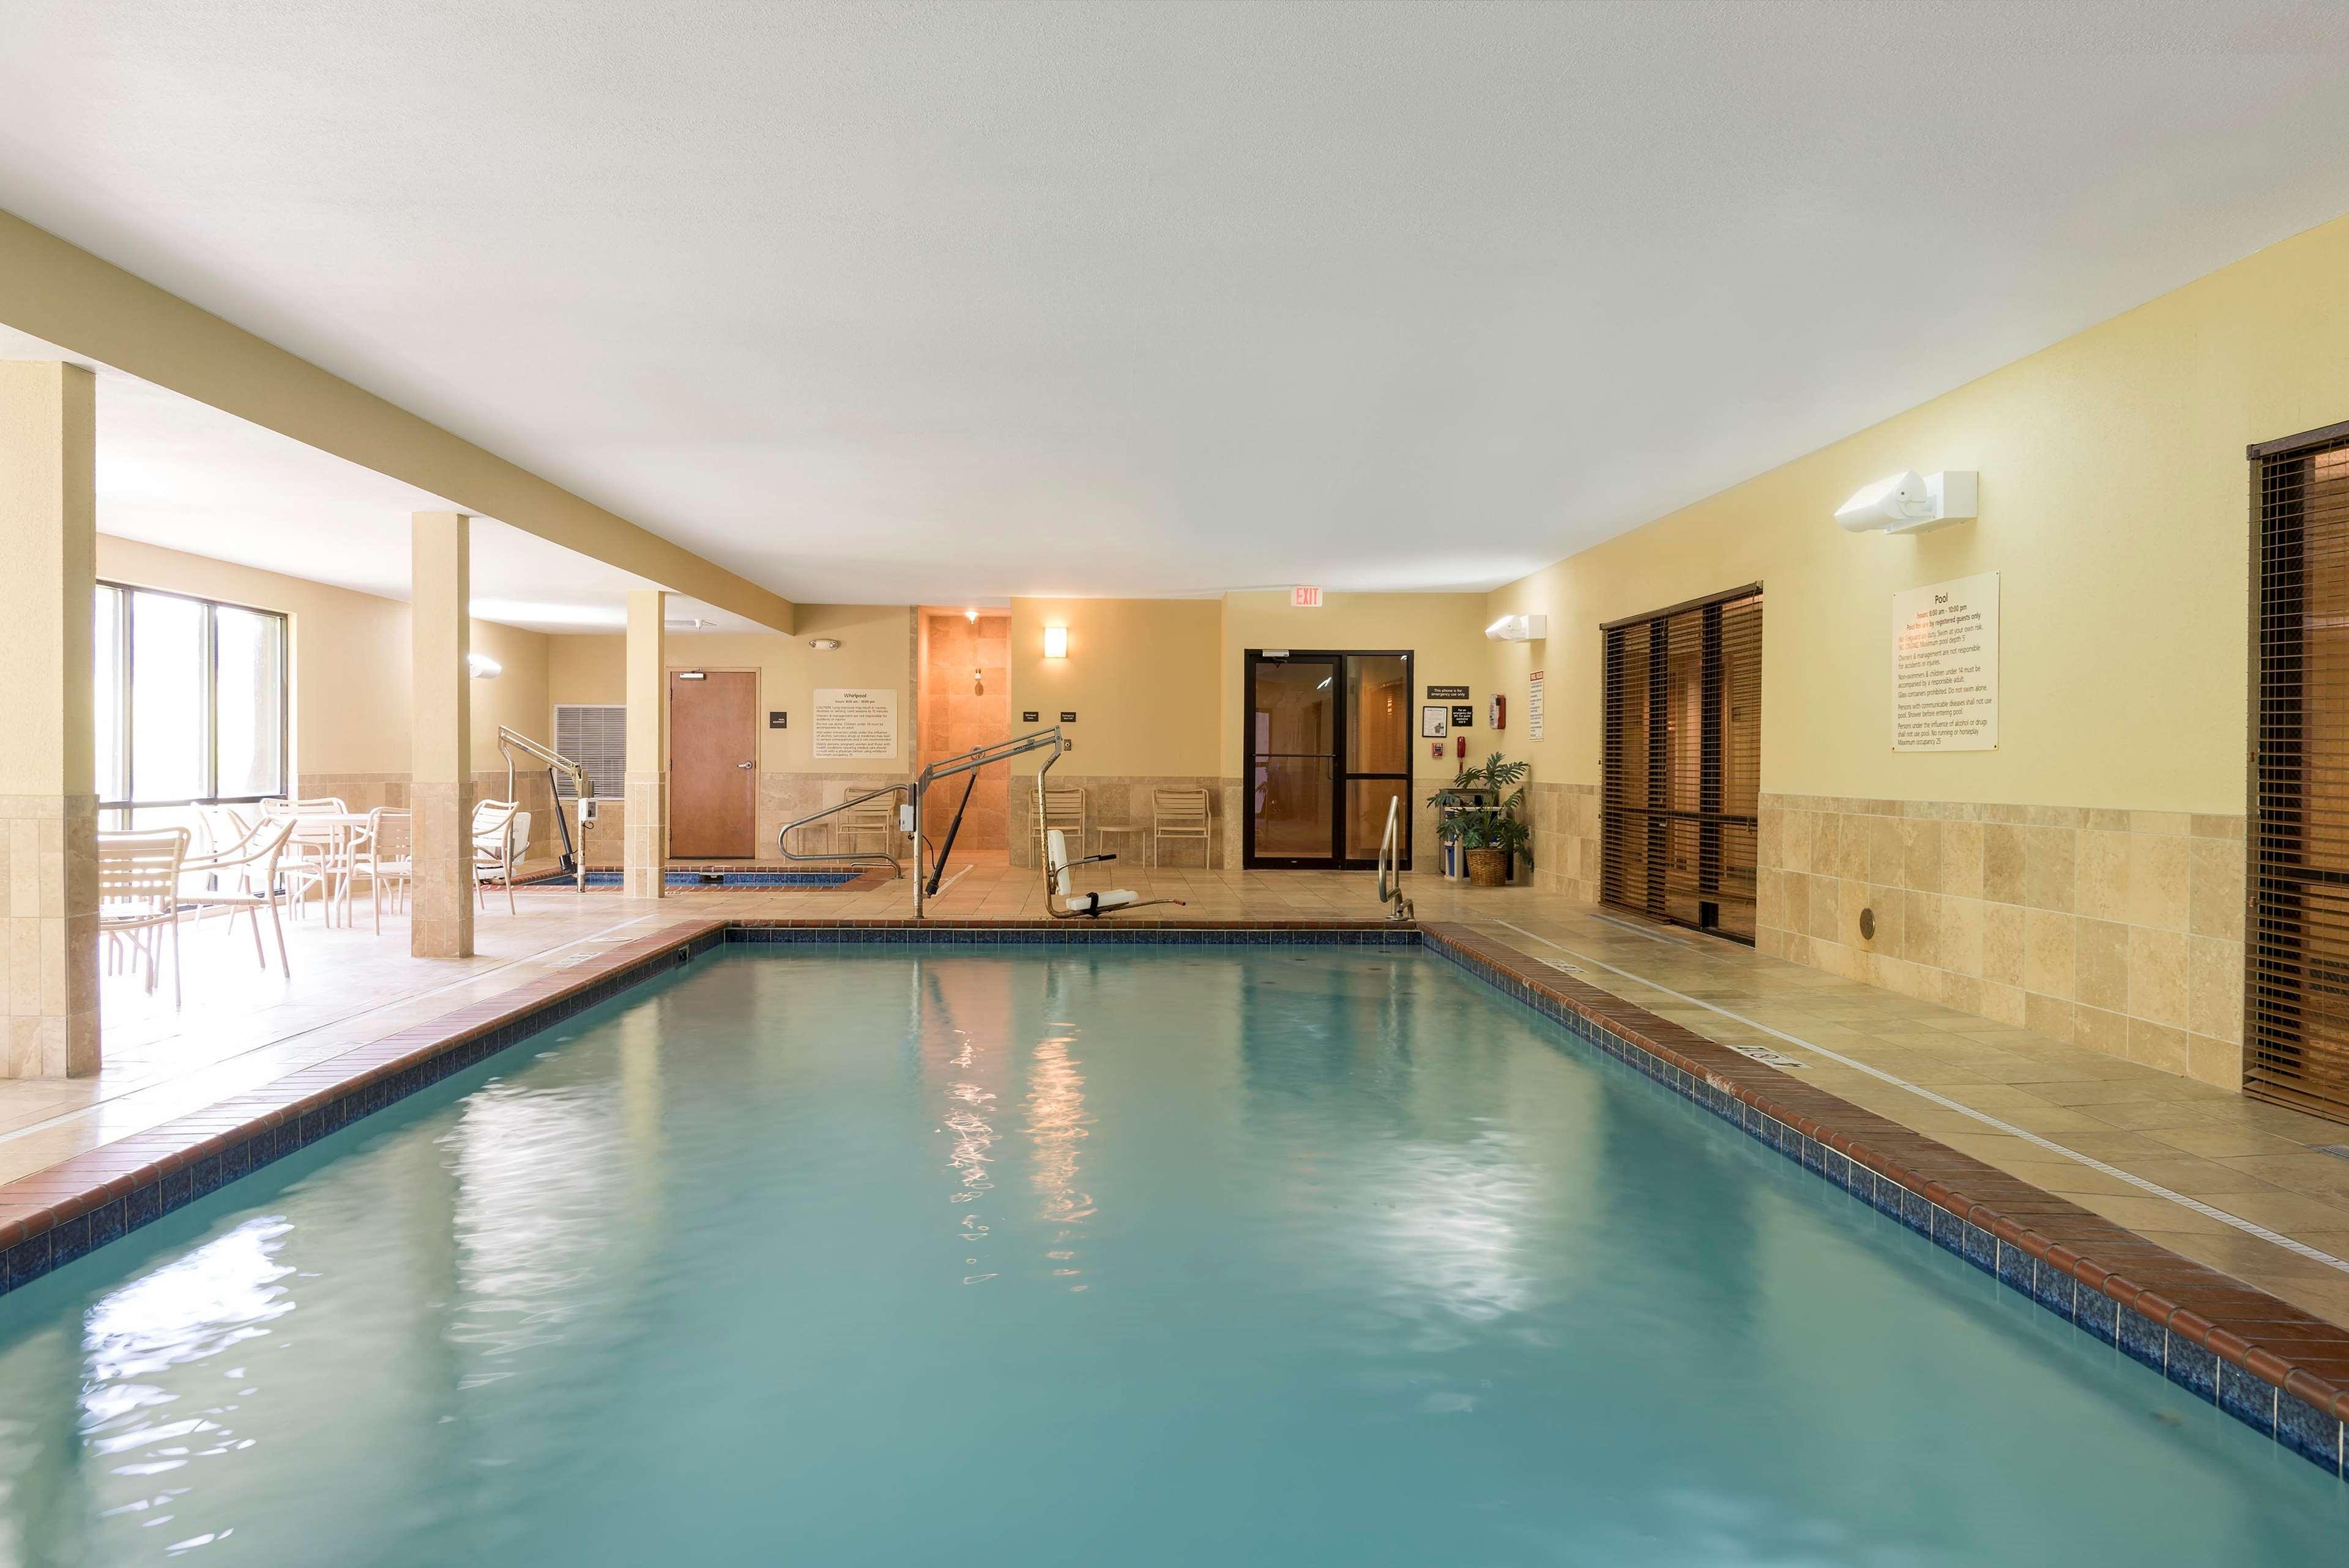 Hampton Inn & Suites Mansfield-South @ I-71 image 23